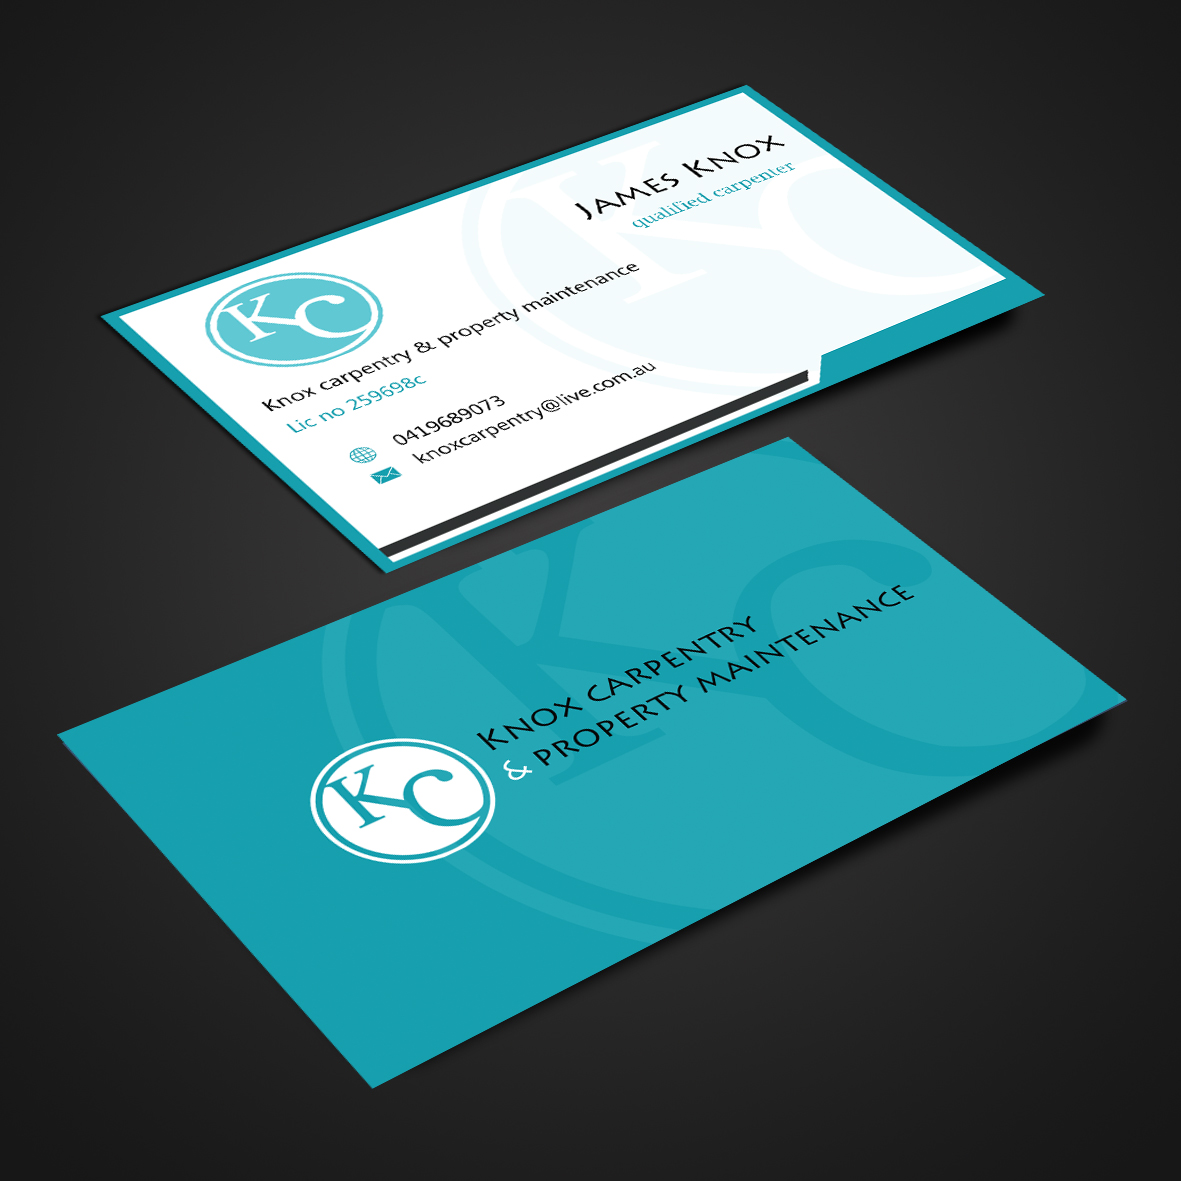 20 professional property maintenance business card designs for Property maintenance business cards